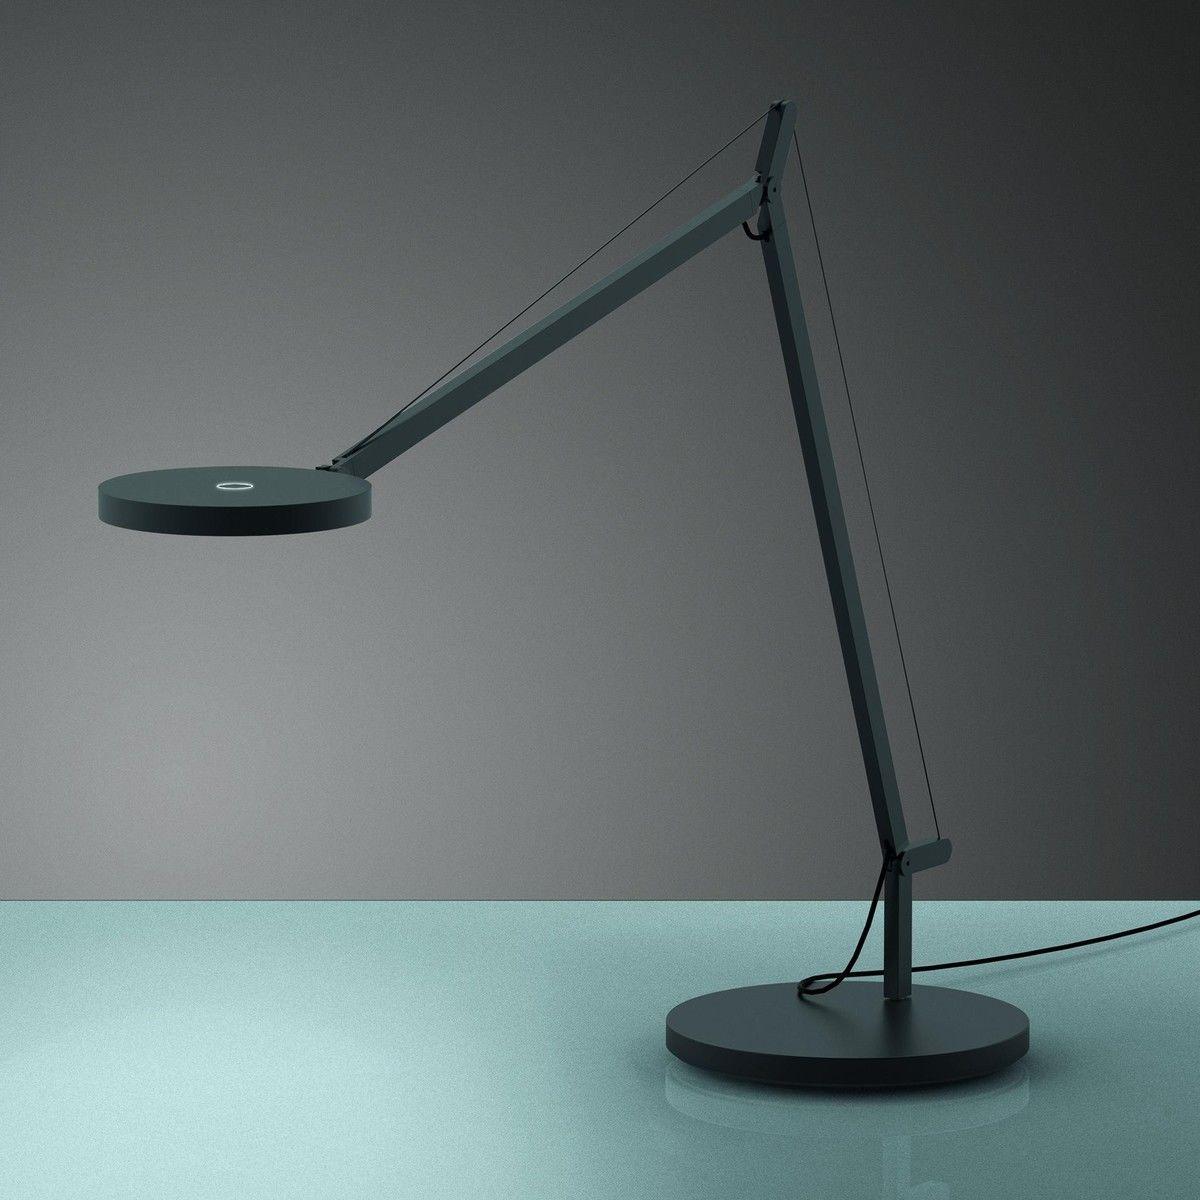 Demetra led lampe de table artemide for Artemide lampe